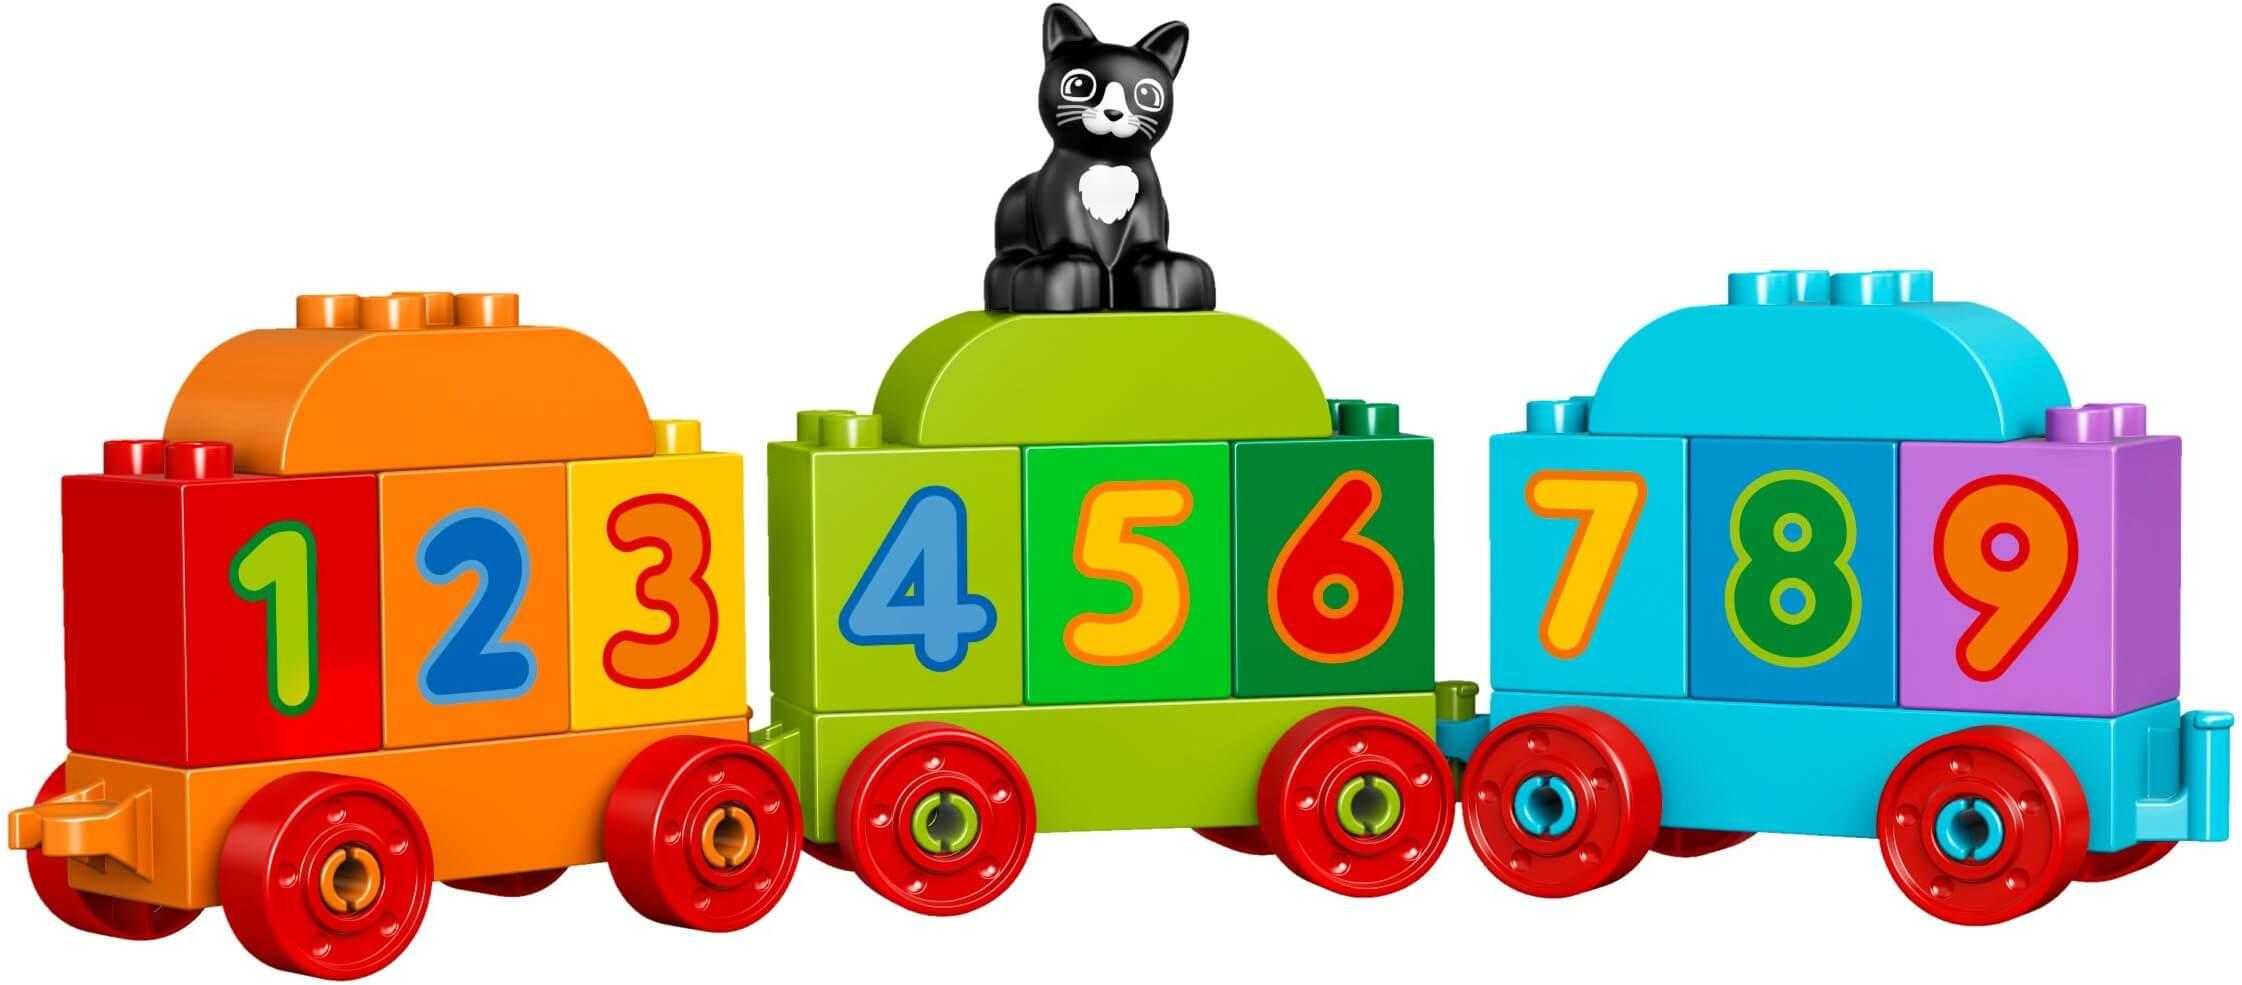 Mua đồ chơi LEGO 10847 - LEGO DUPLO 10847 - Đoàn Tàu Số Học (LEGO 10847 Number Train)